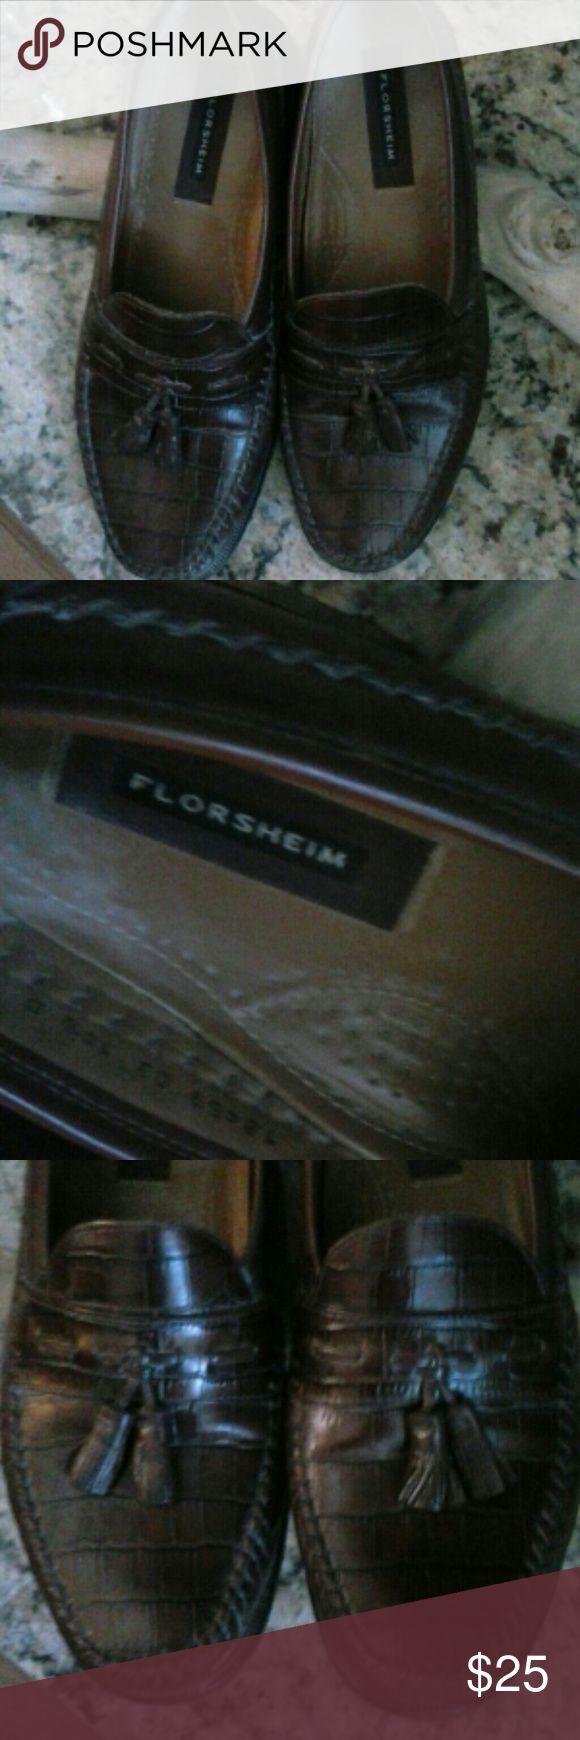 LNFlorsheim Men's Leather Loafers Brown 10 D Like New Brown leather men's loafers all leather. Scuff marks on bottom of shoe little wear. Florsheim Shoes Loafers & Slip-Ons